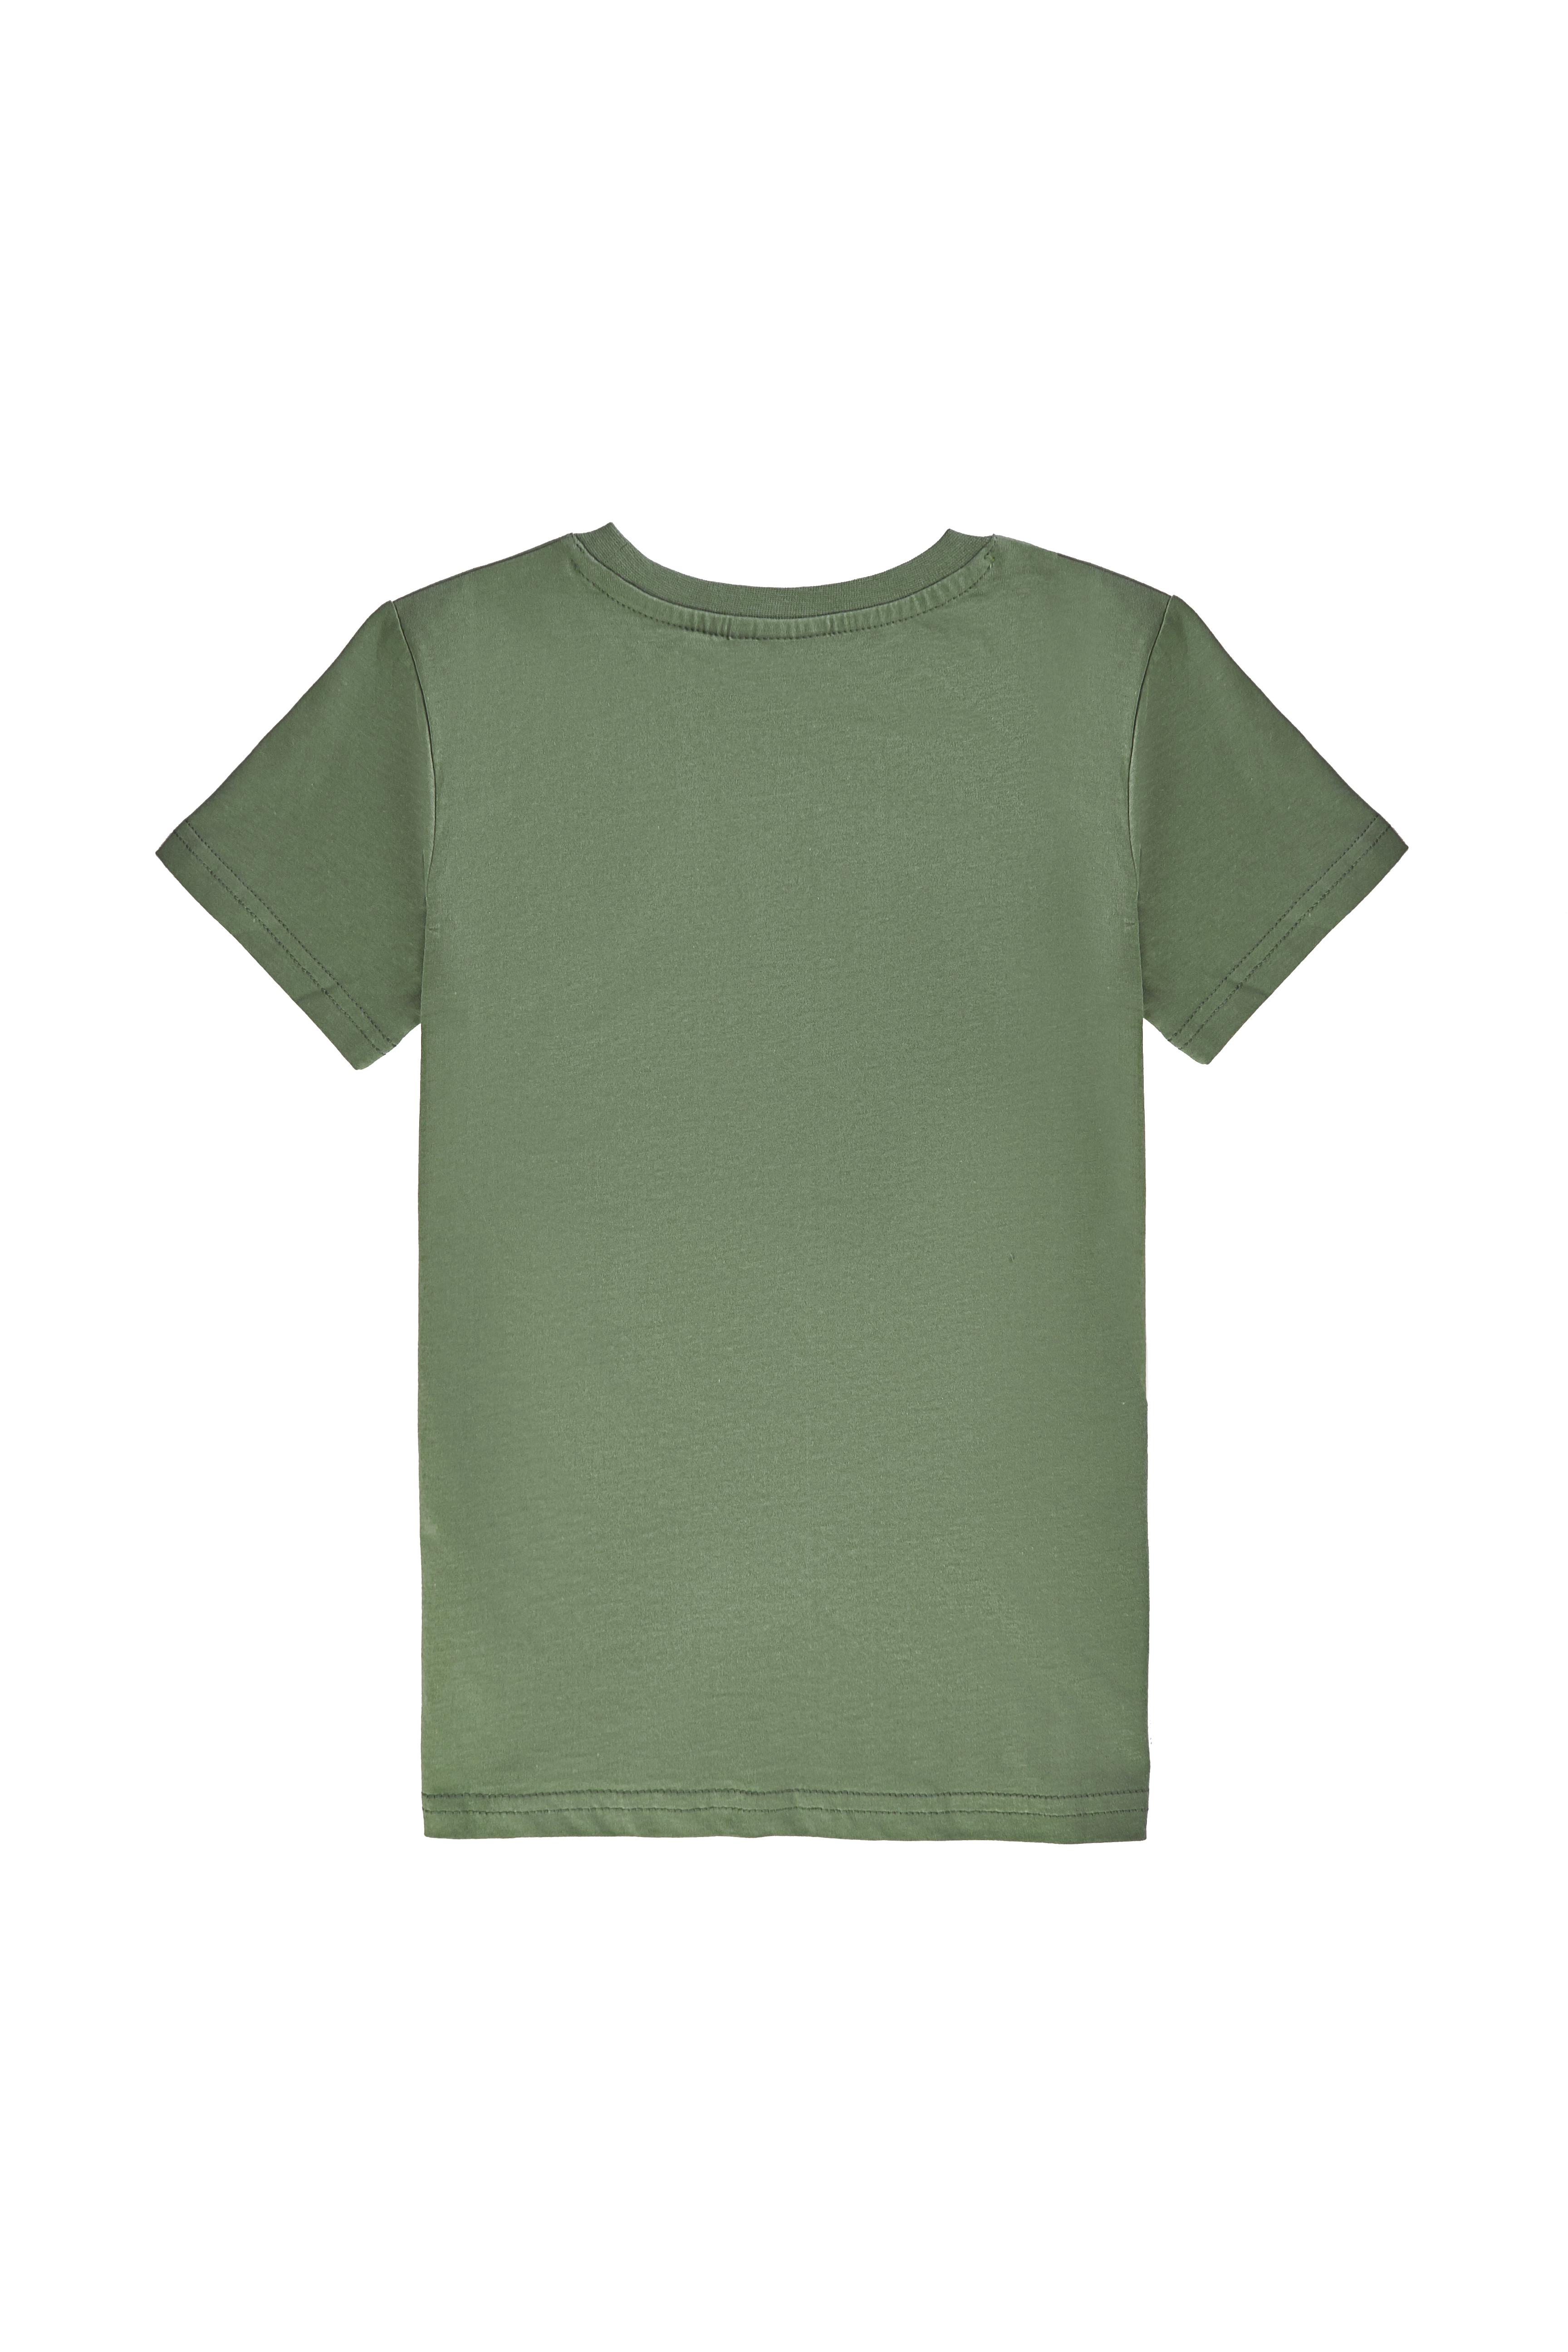 Chlapecké tričko Street Biking - khaki Bílá, Khaki